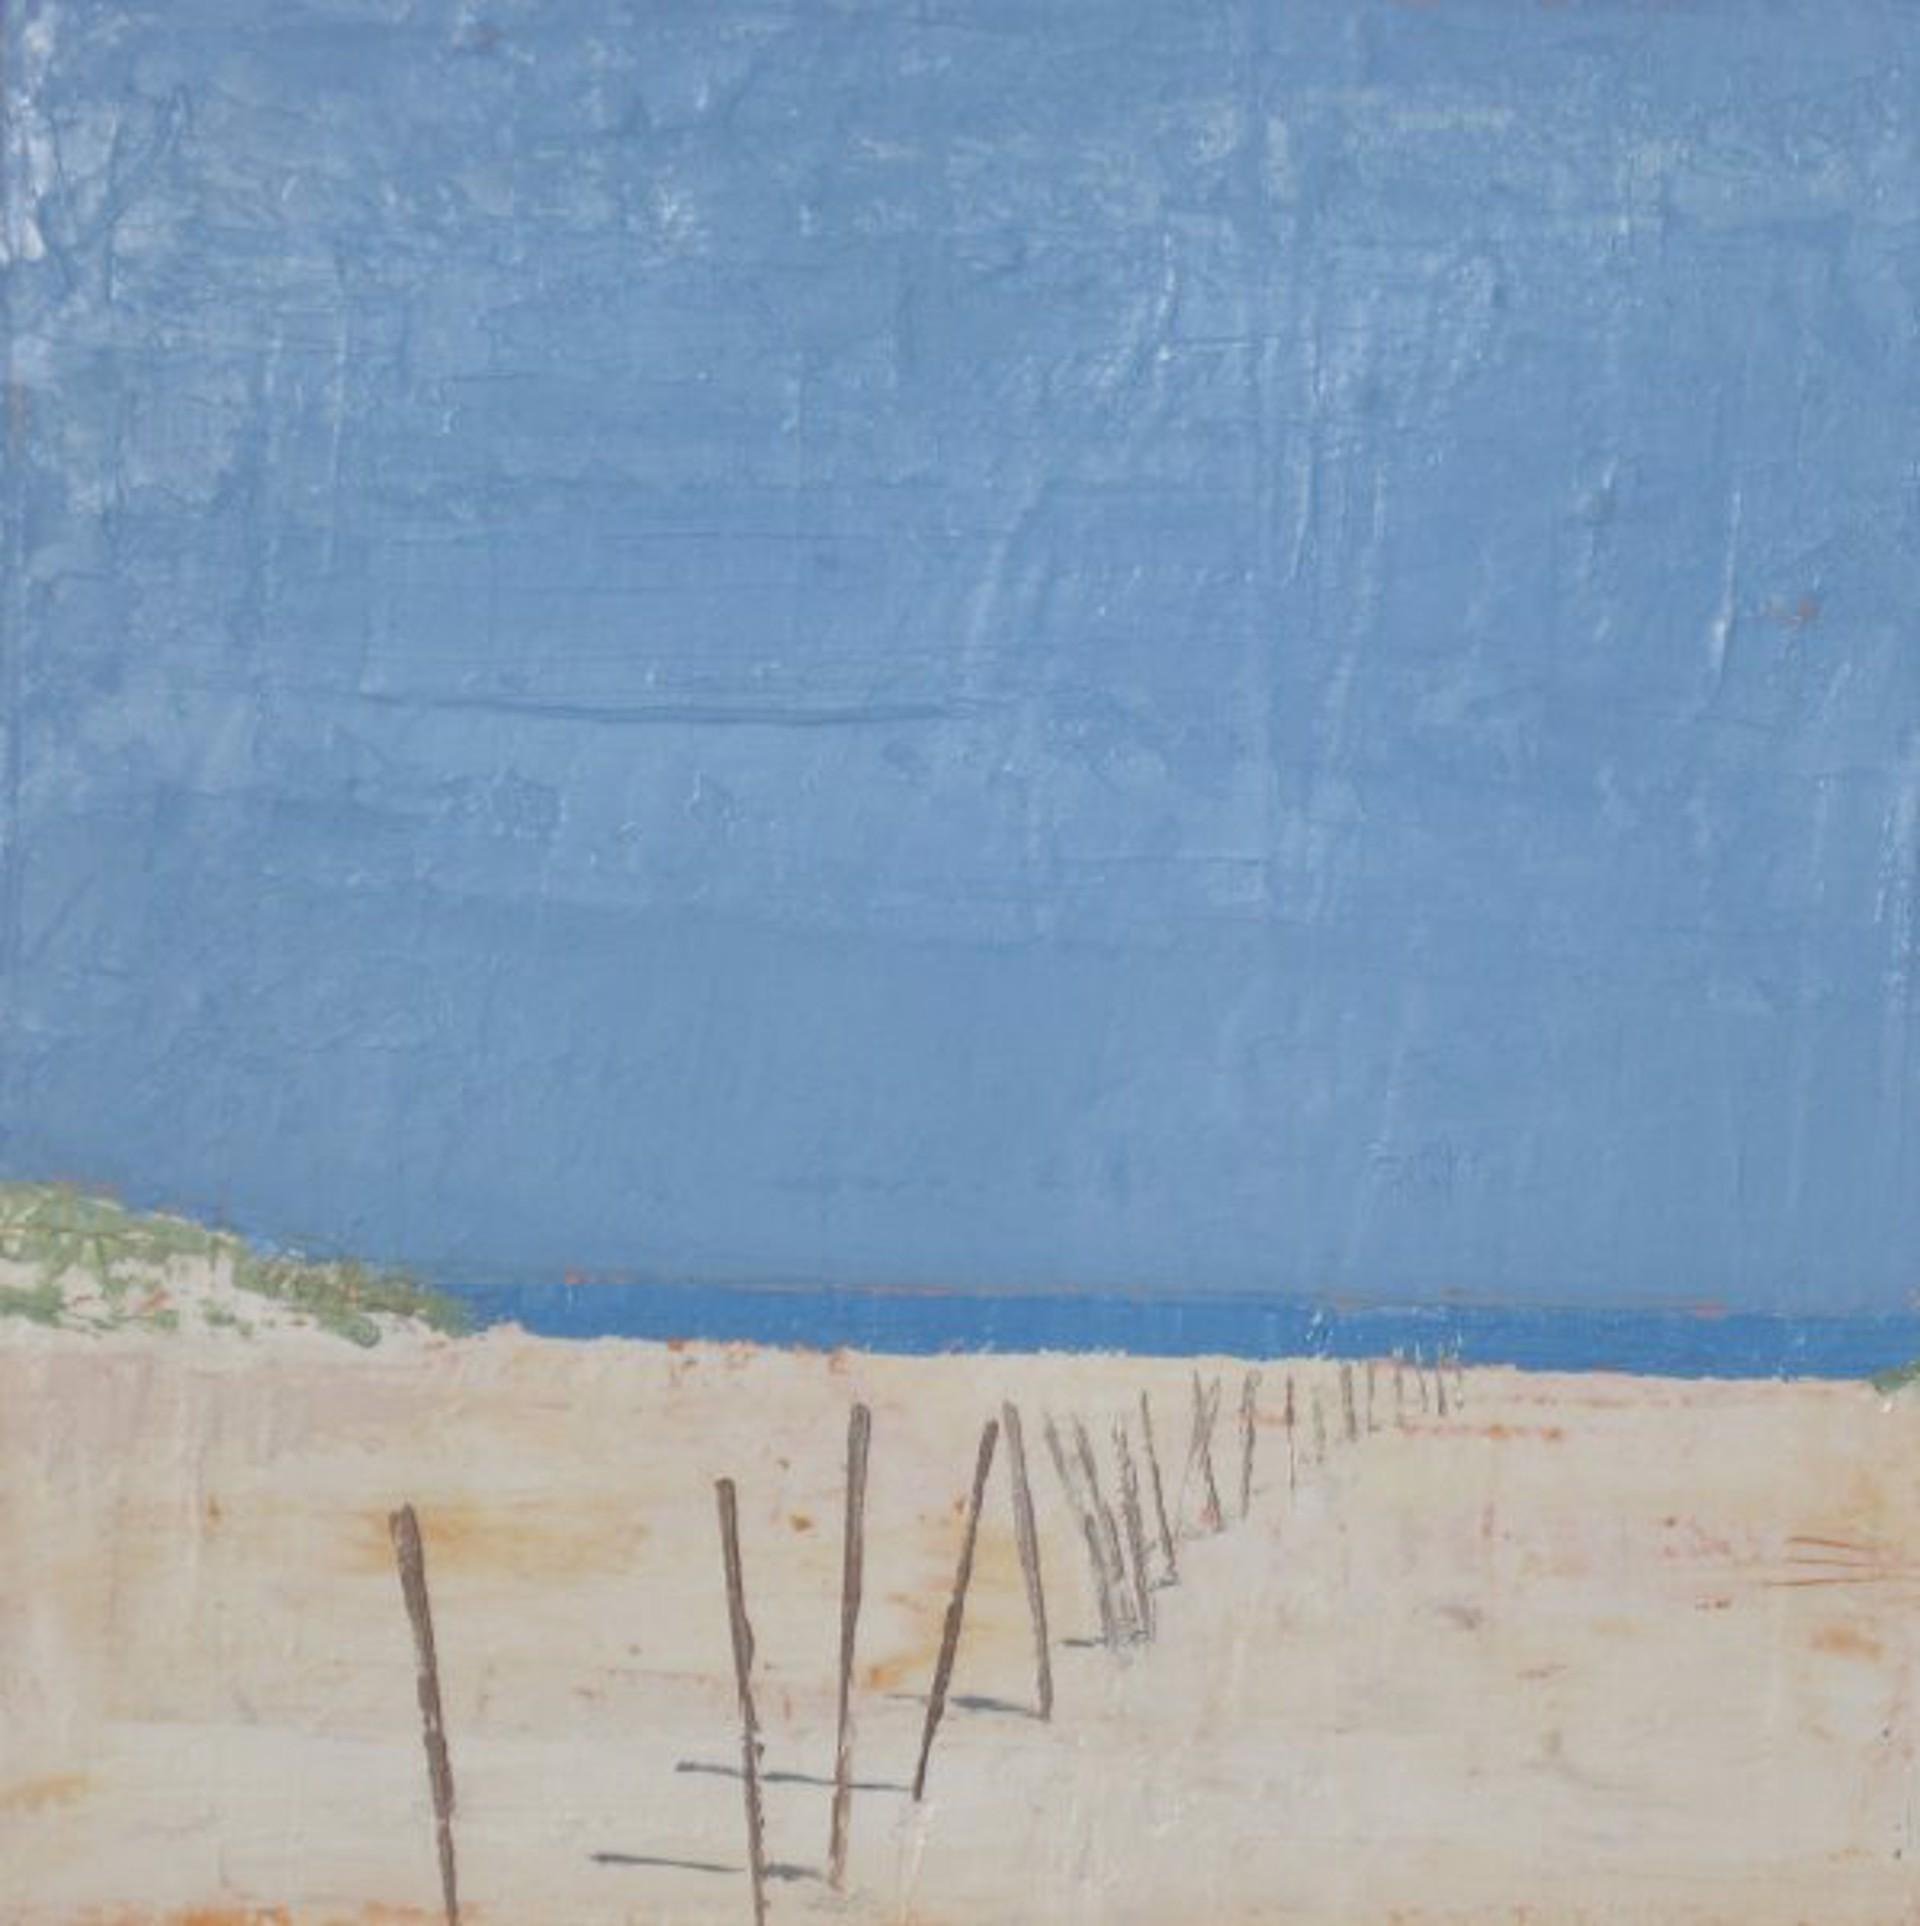 Land, Water, Sky # 25 by Richard Garrison